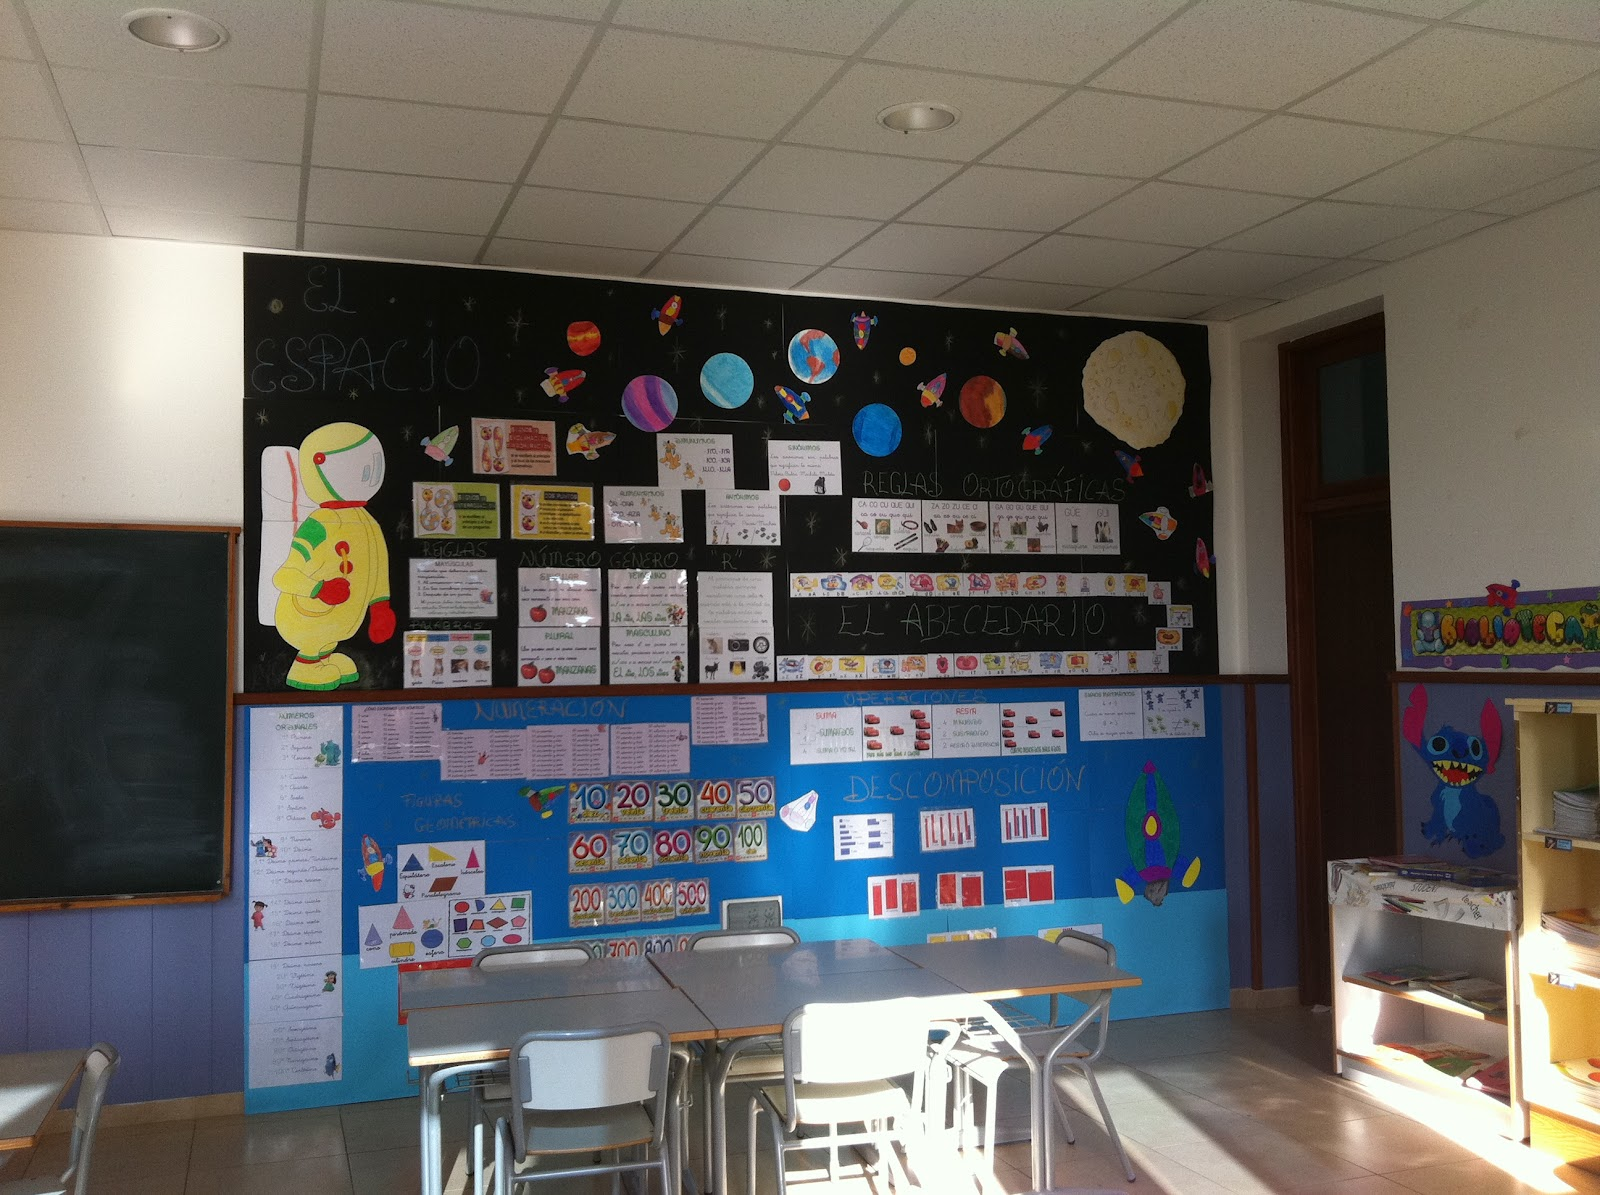 Decoraci n aula primaria imagui for Decoracion aula primaria